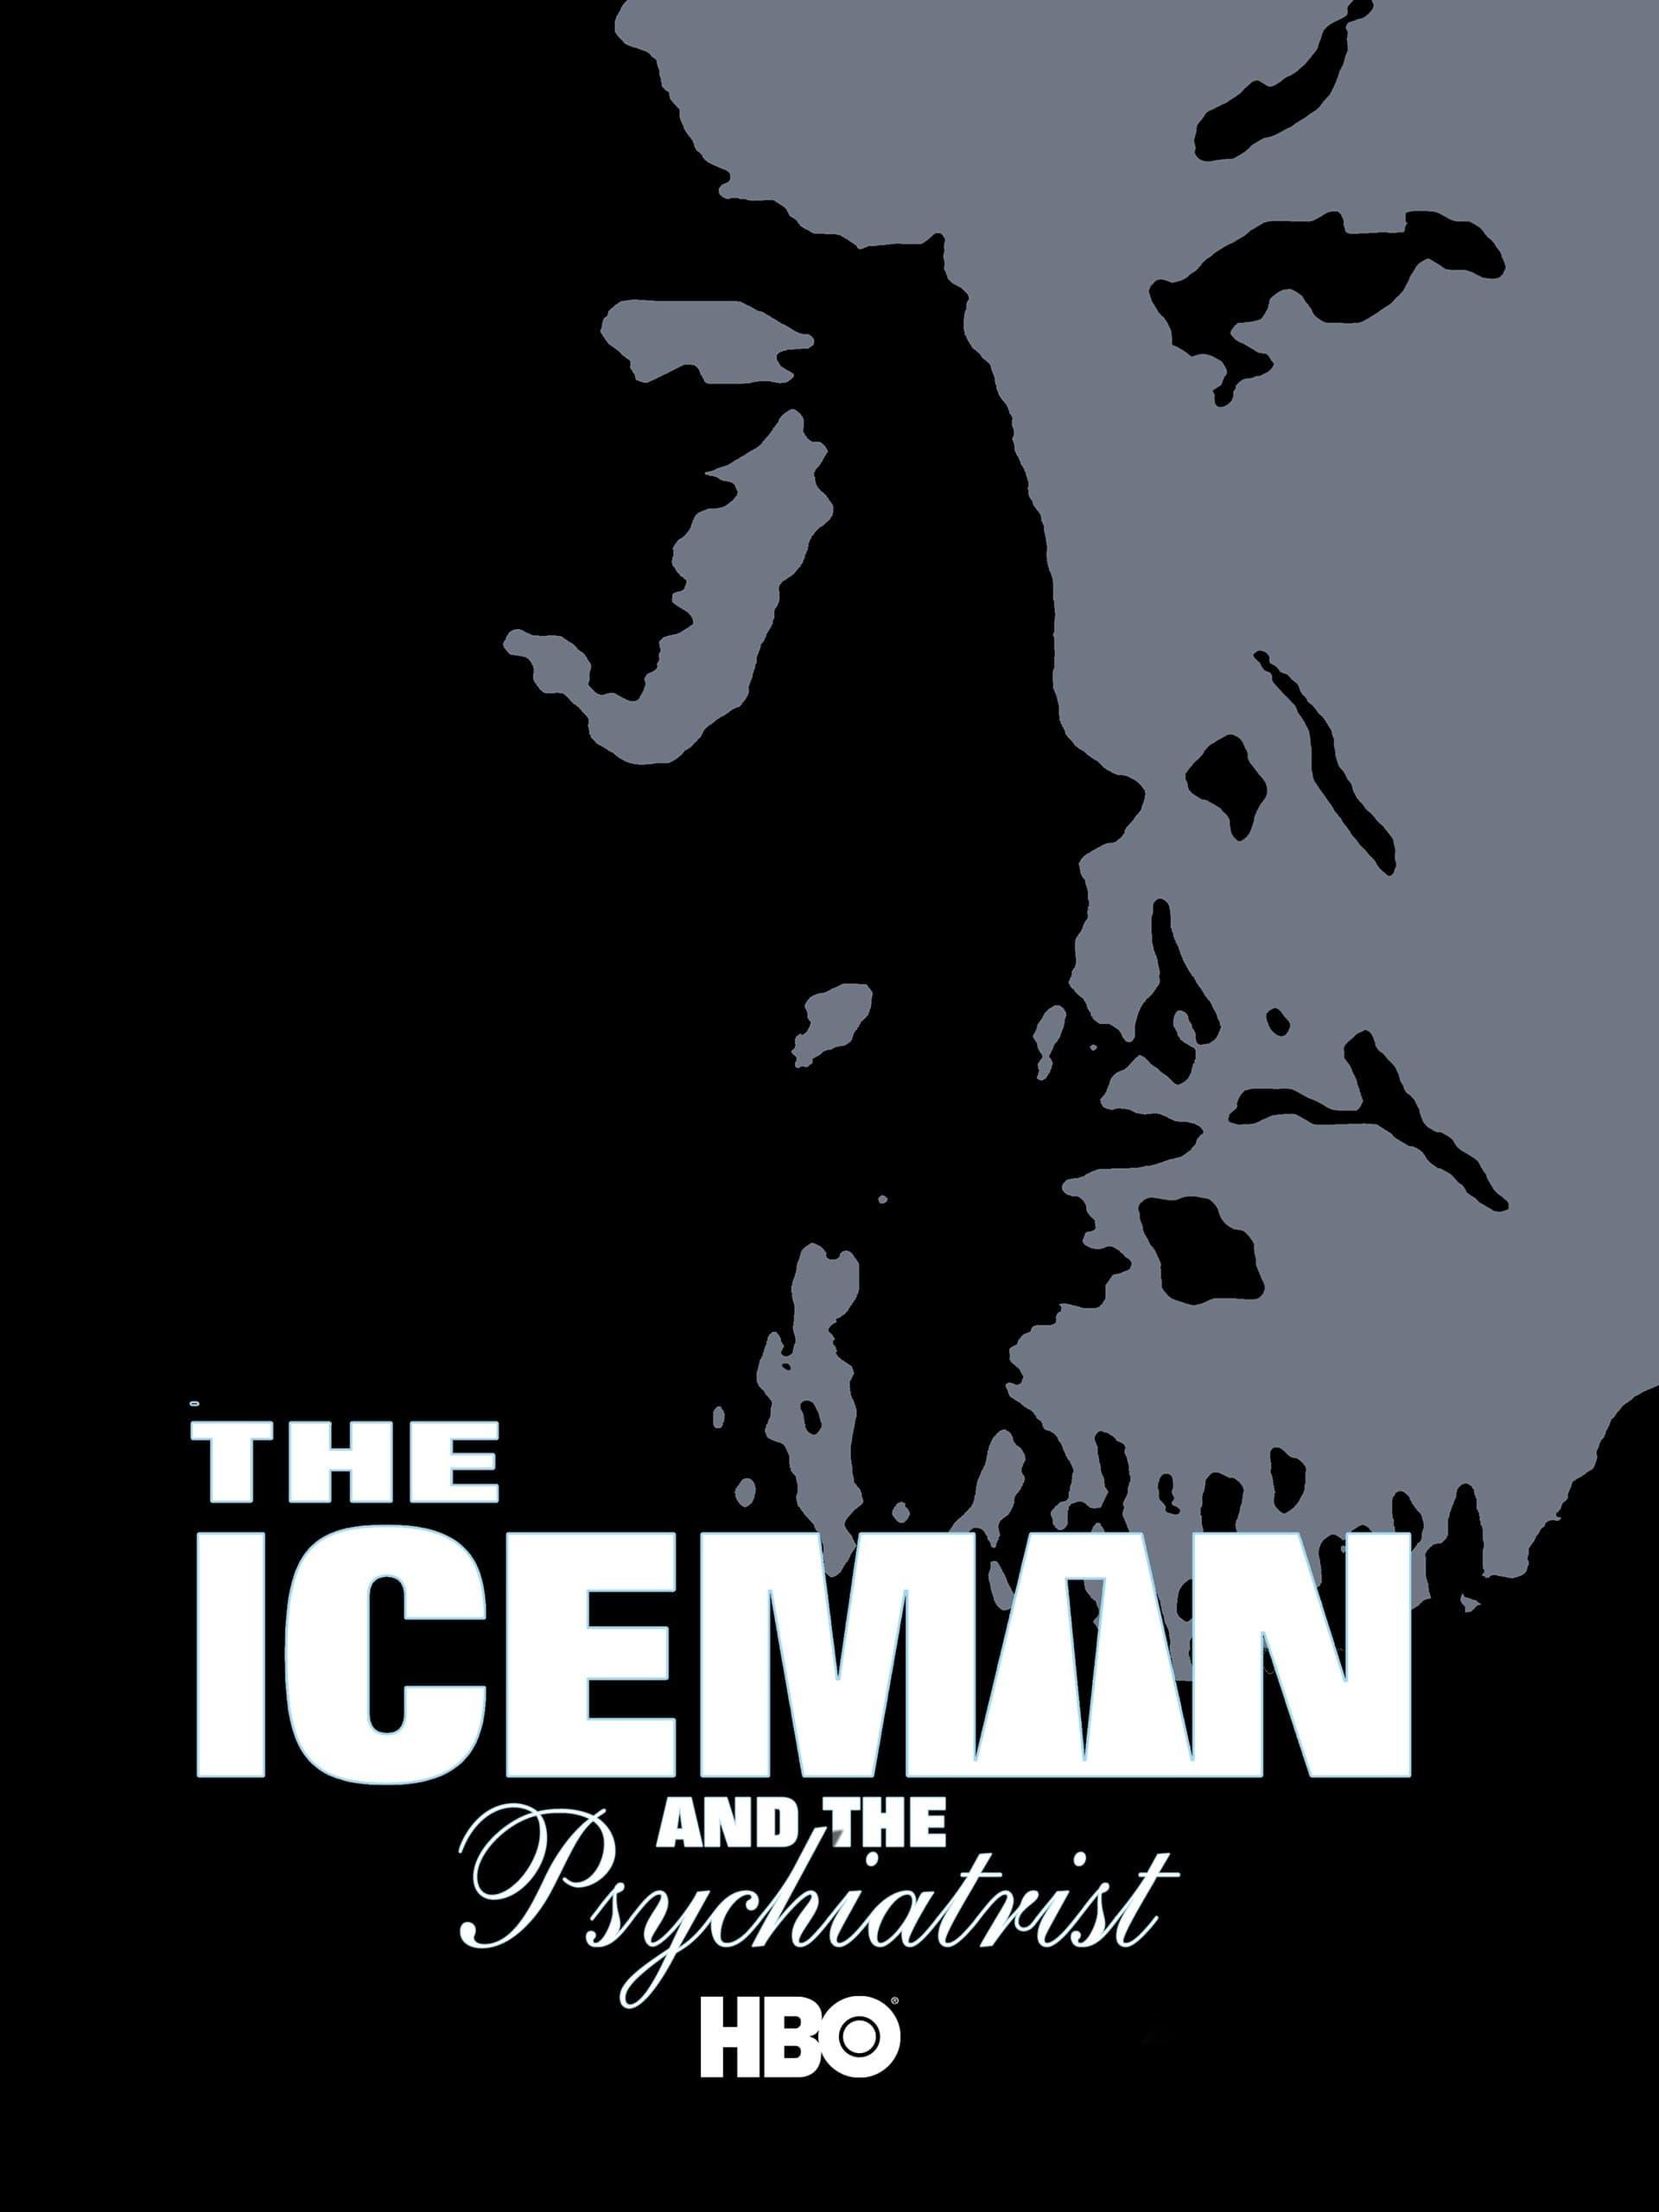 América Nua e Crua - Iceman e o Psiquiatra